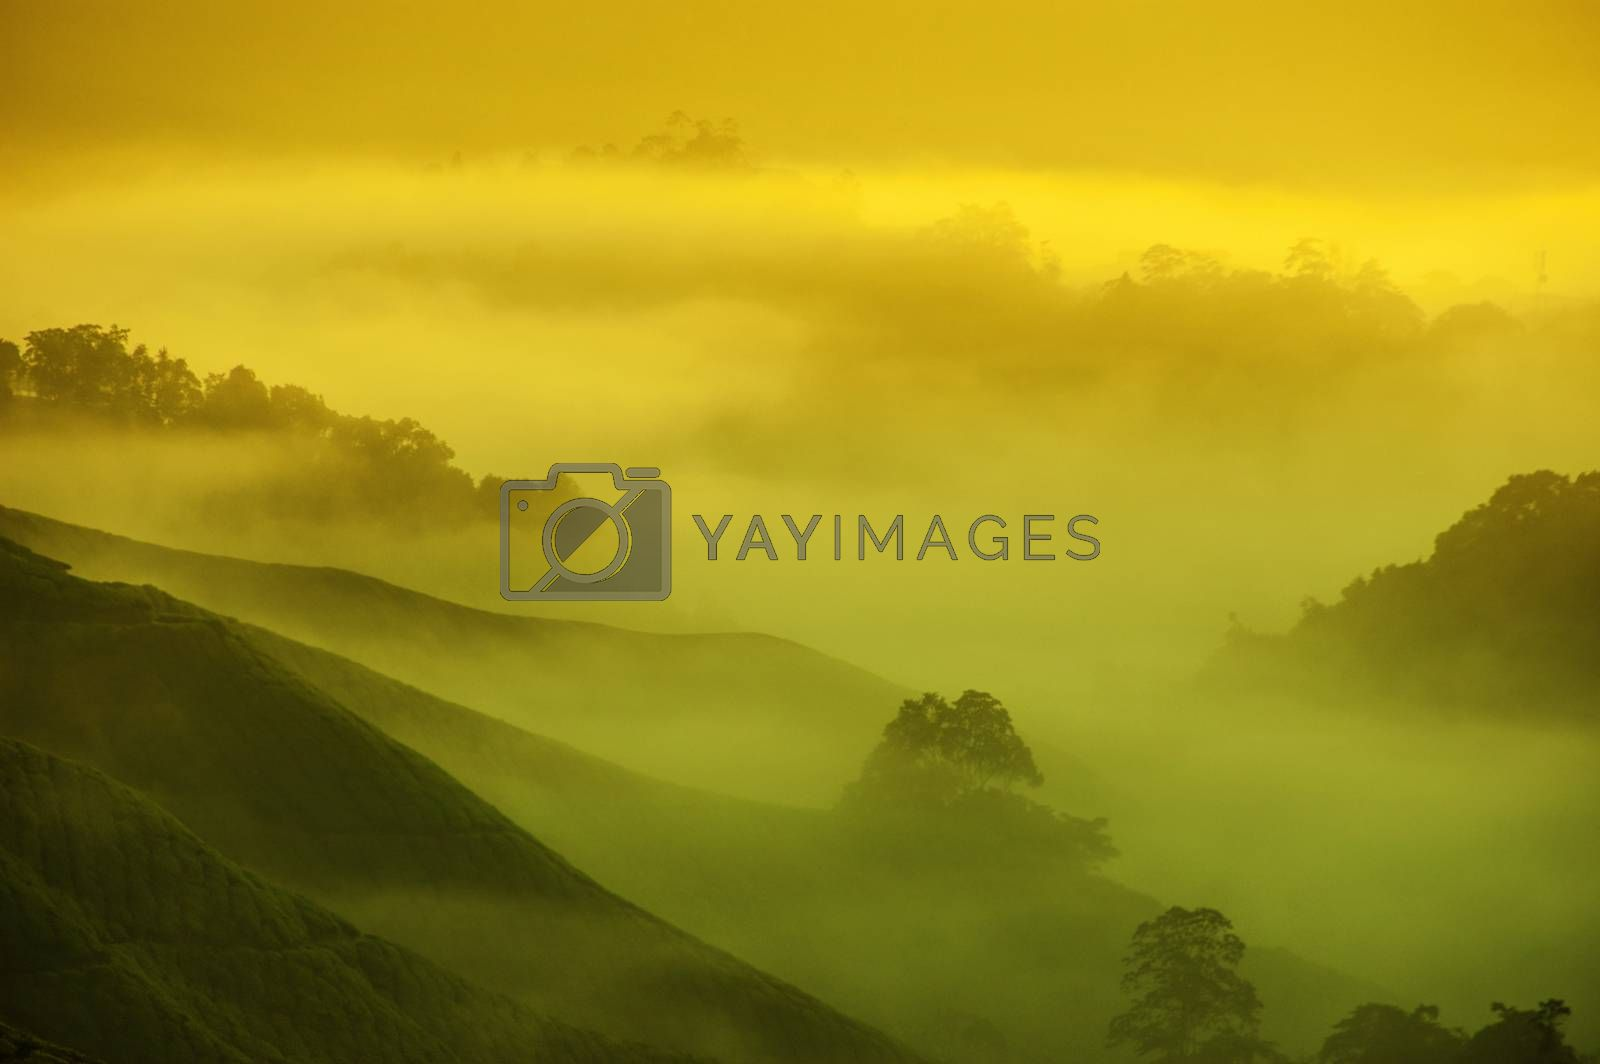 Tea farm in sunrise with misty golden sunlight at Cameron Highlands, Malaysia